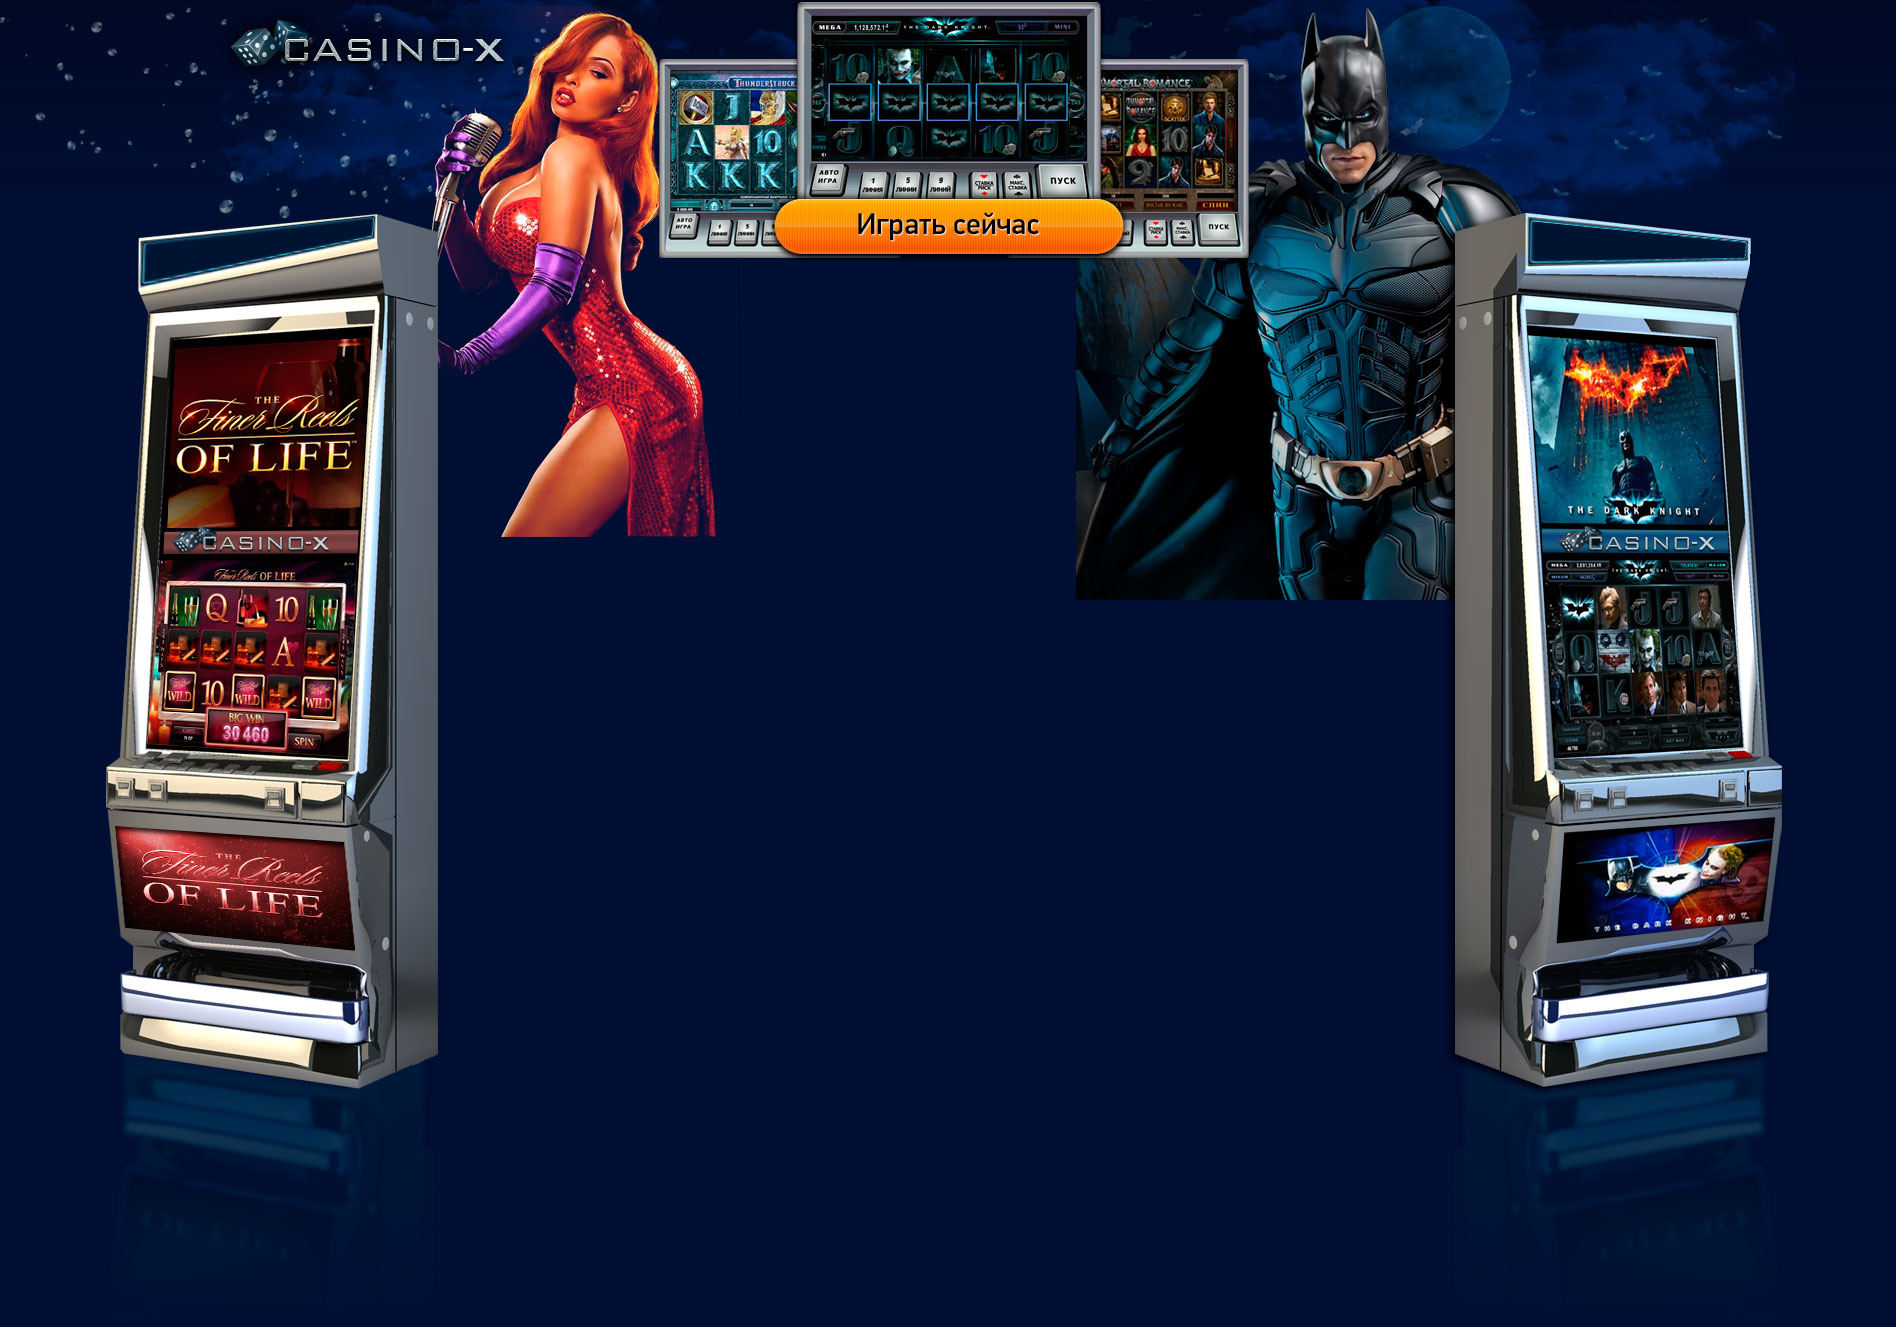 Zaycev net casino